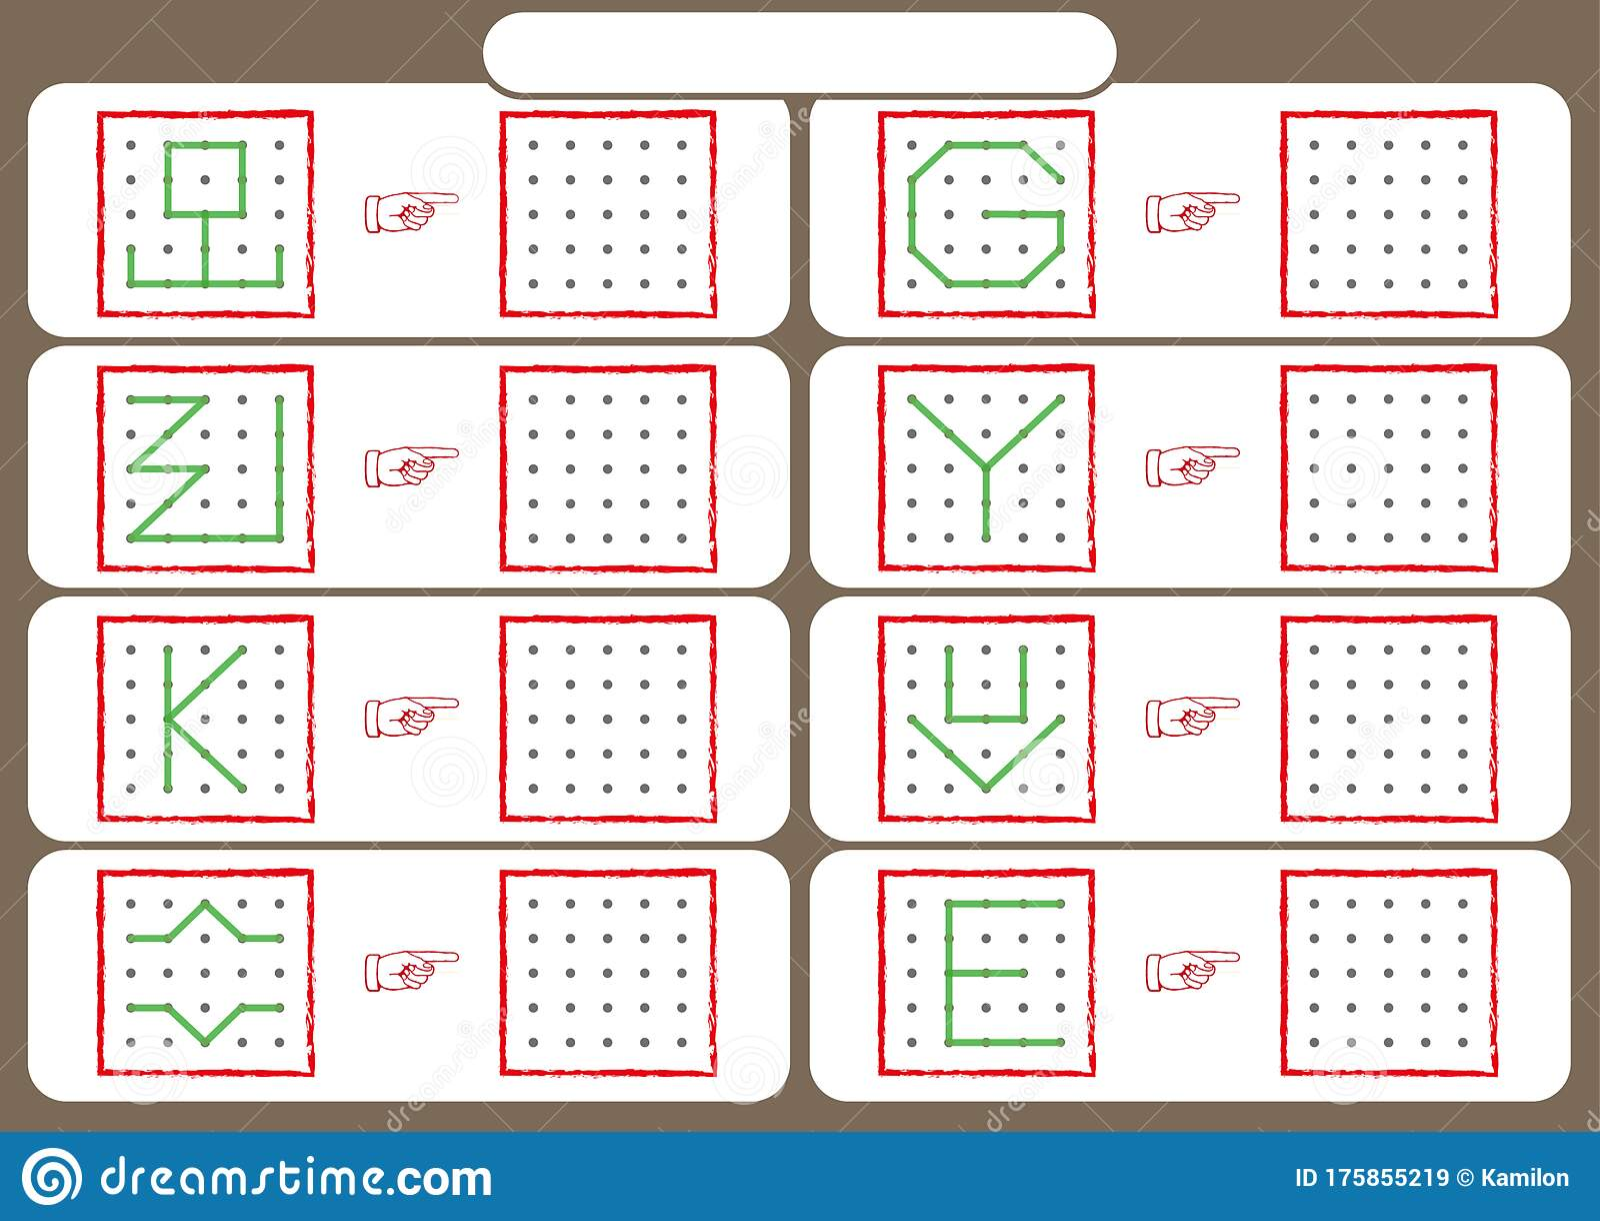 Worksheet For Preschool Kids Dot To Dot Copy Practice